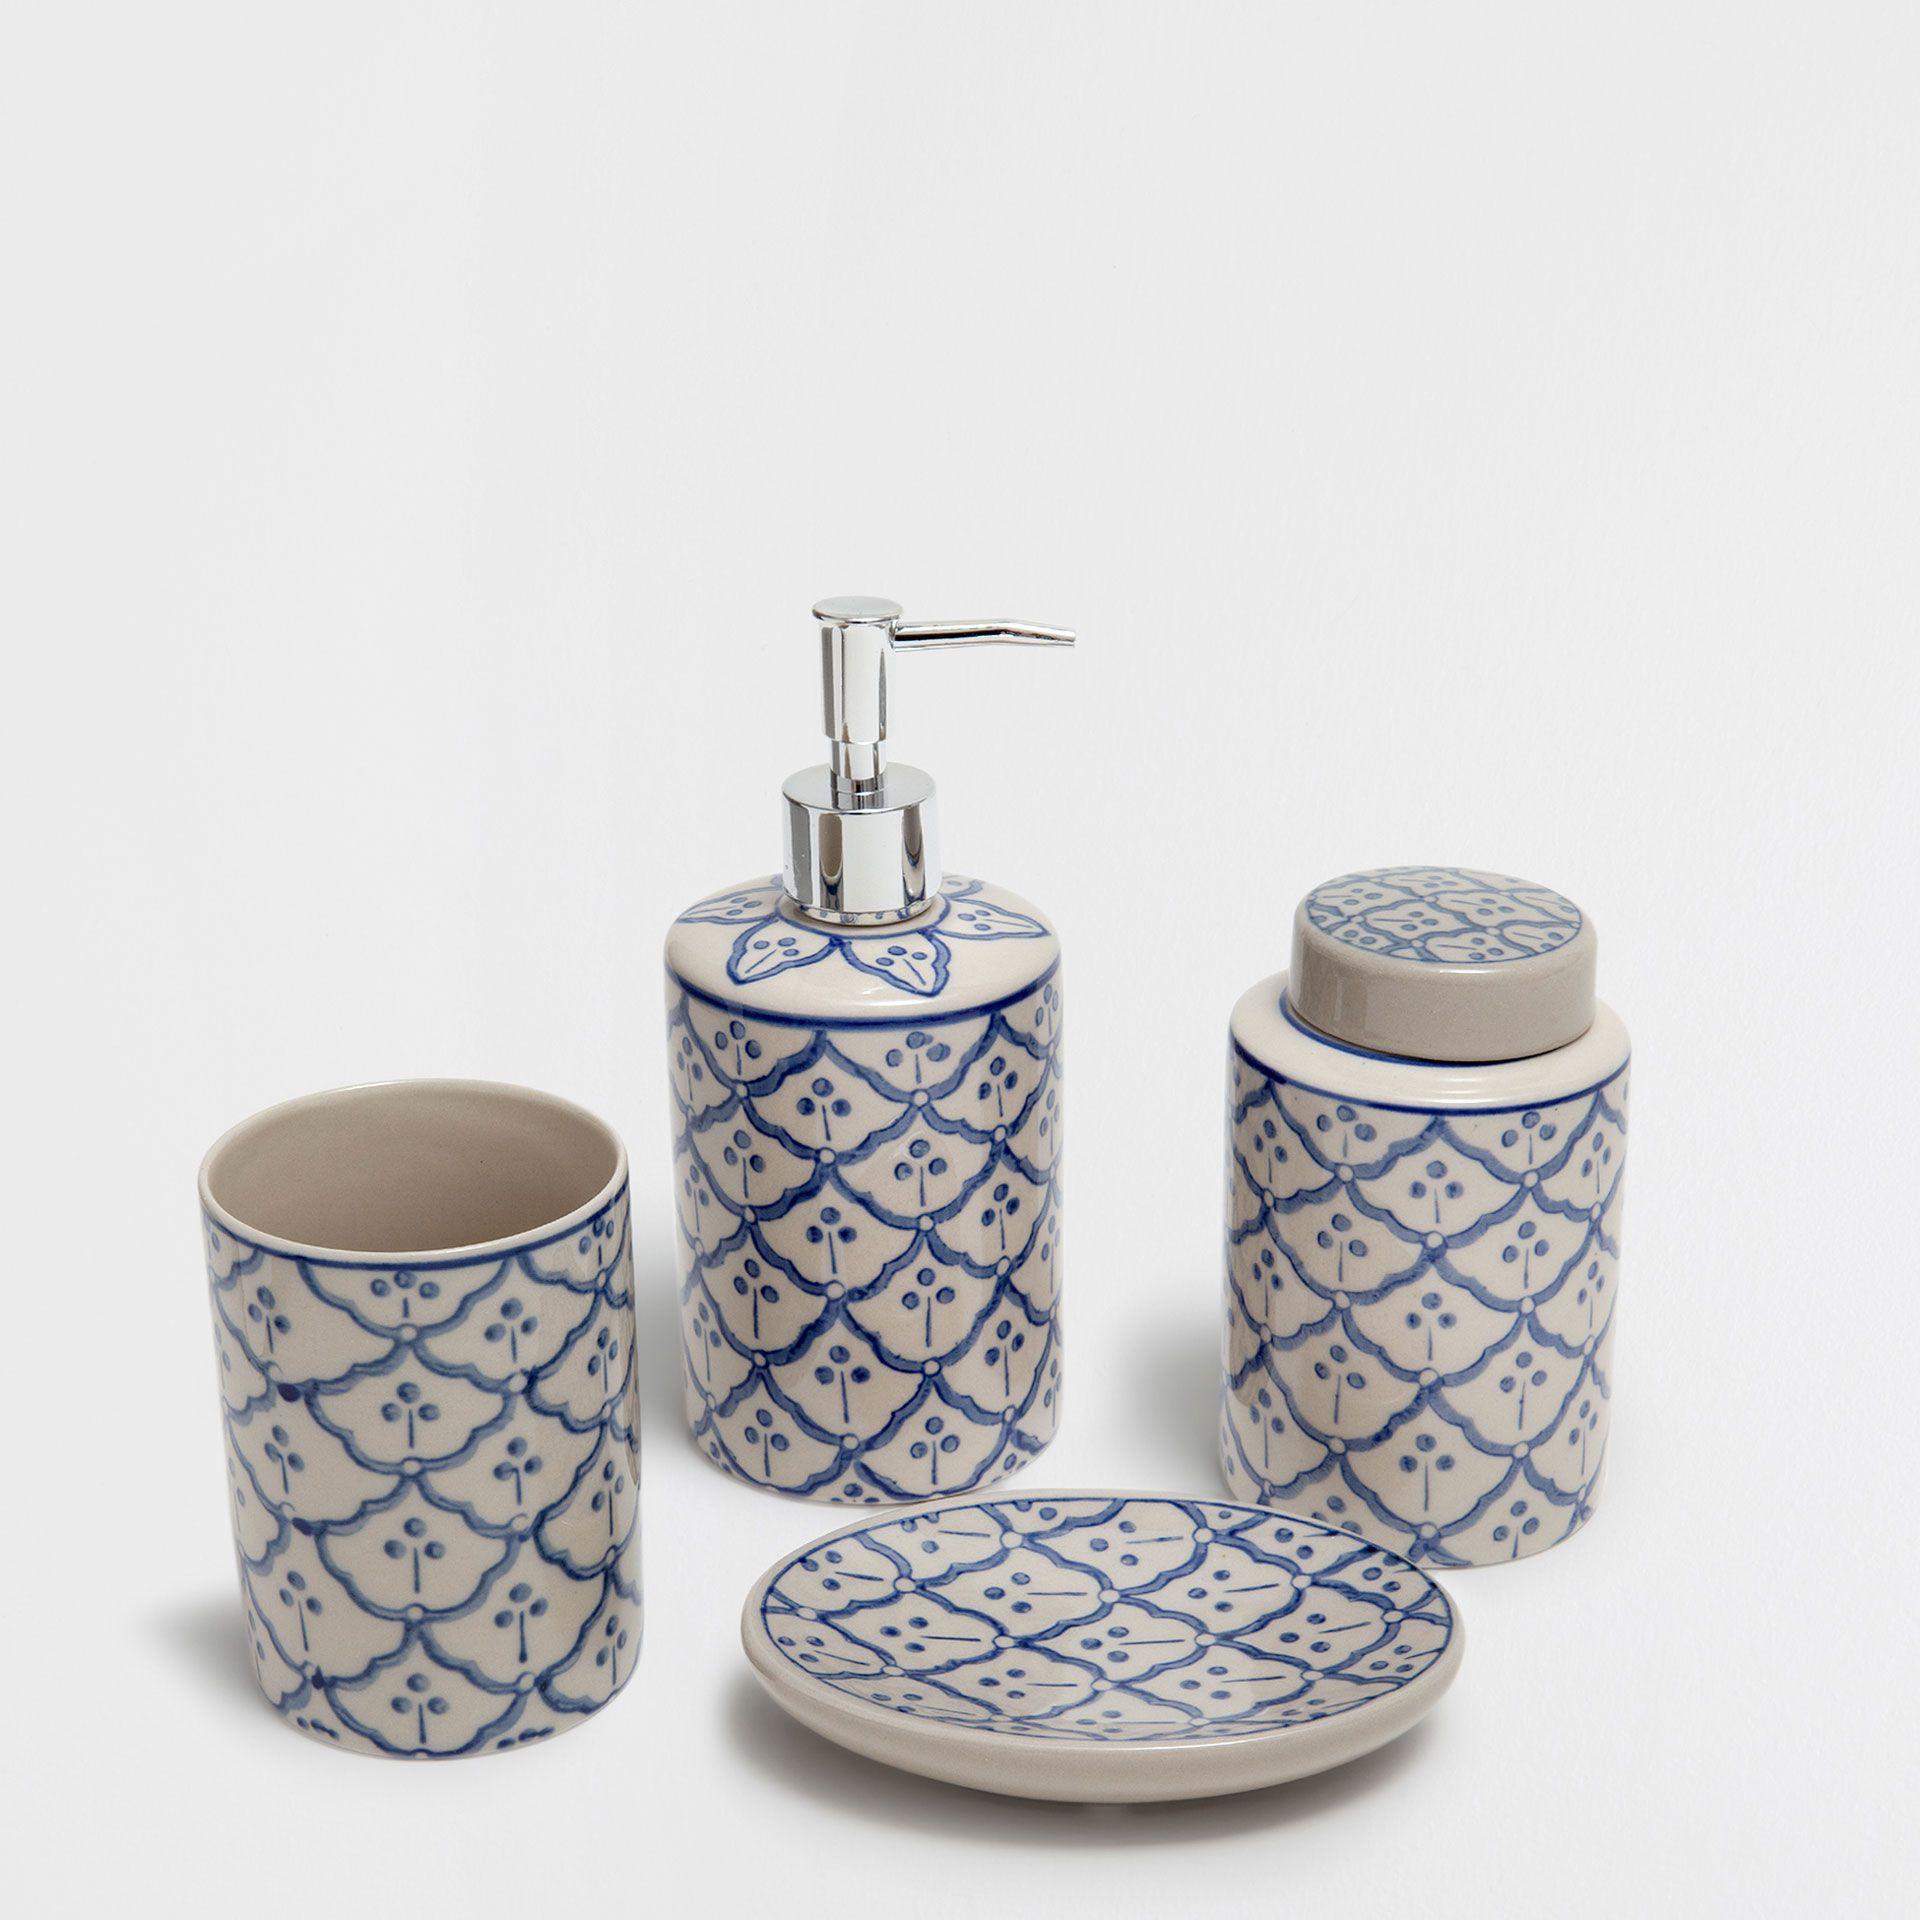 GRAY PATTERNED CERAMIC BATHROOM SET | My Home | Pinterest | Grey ...